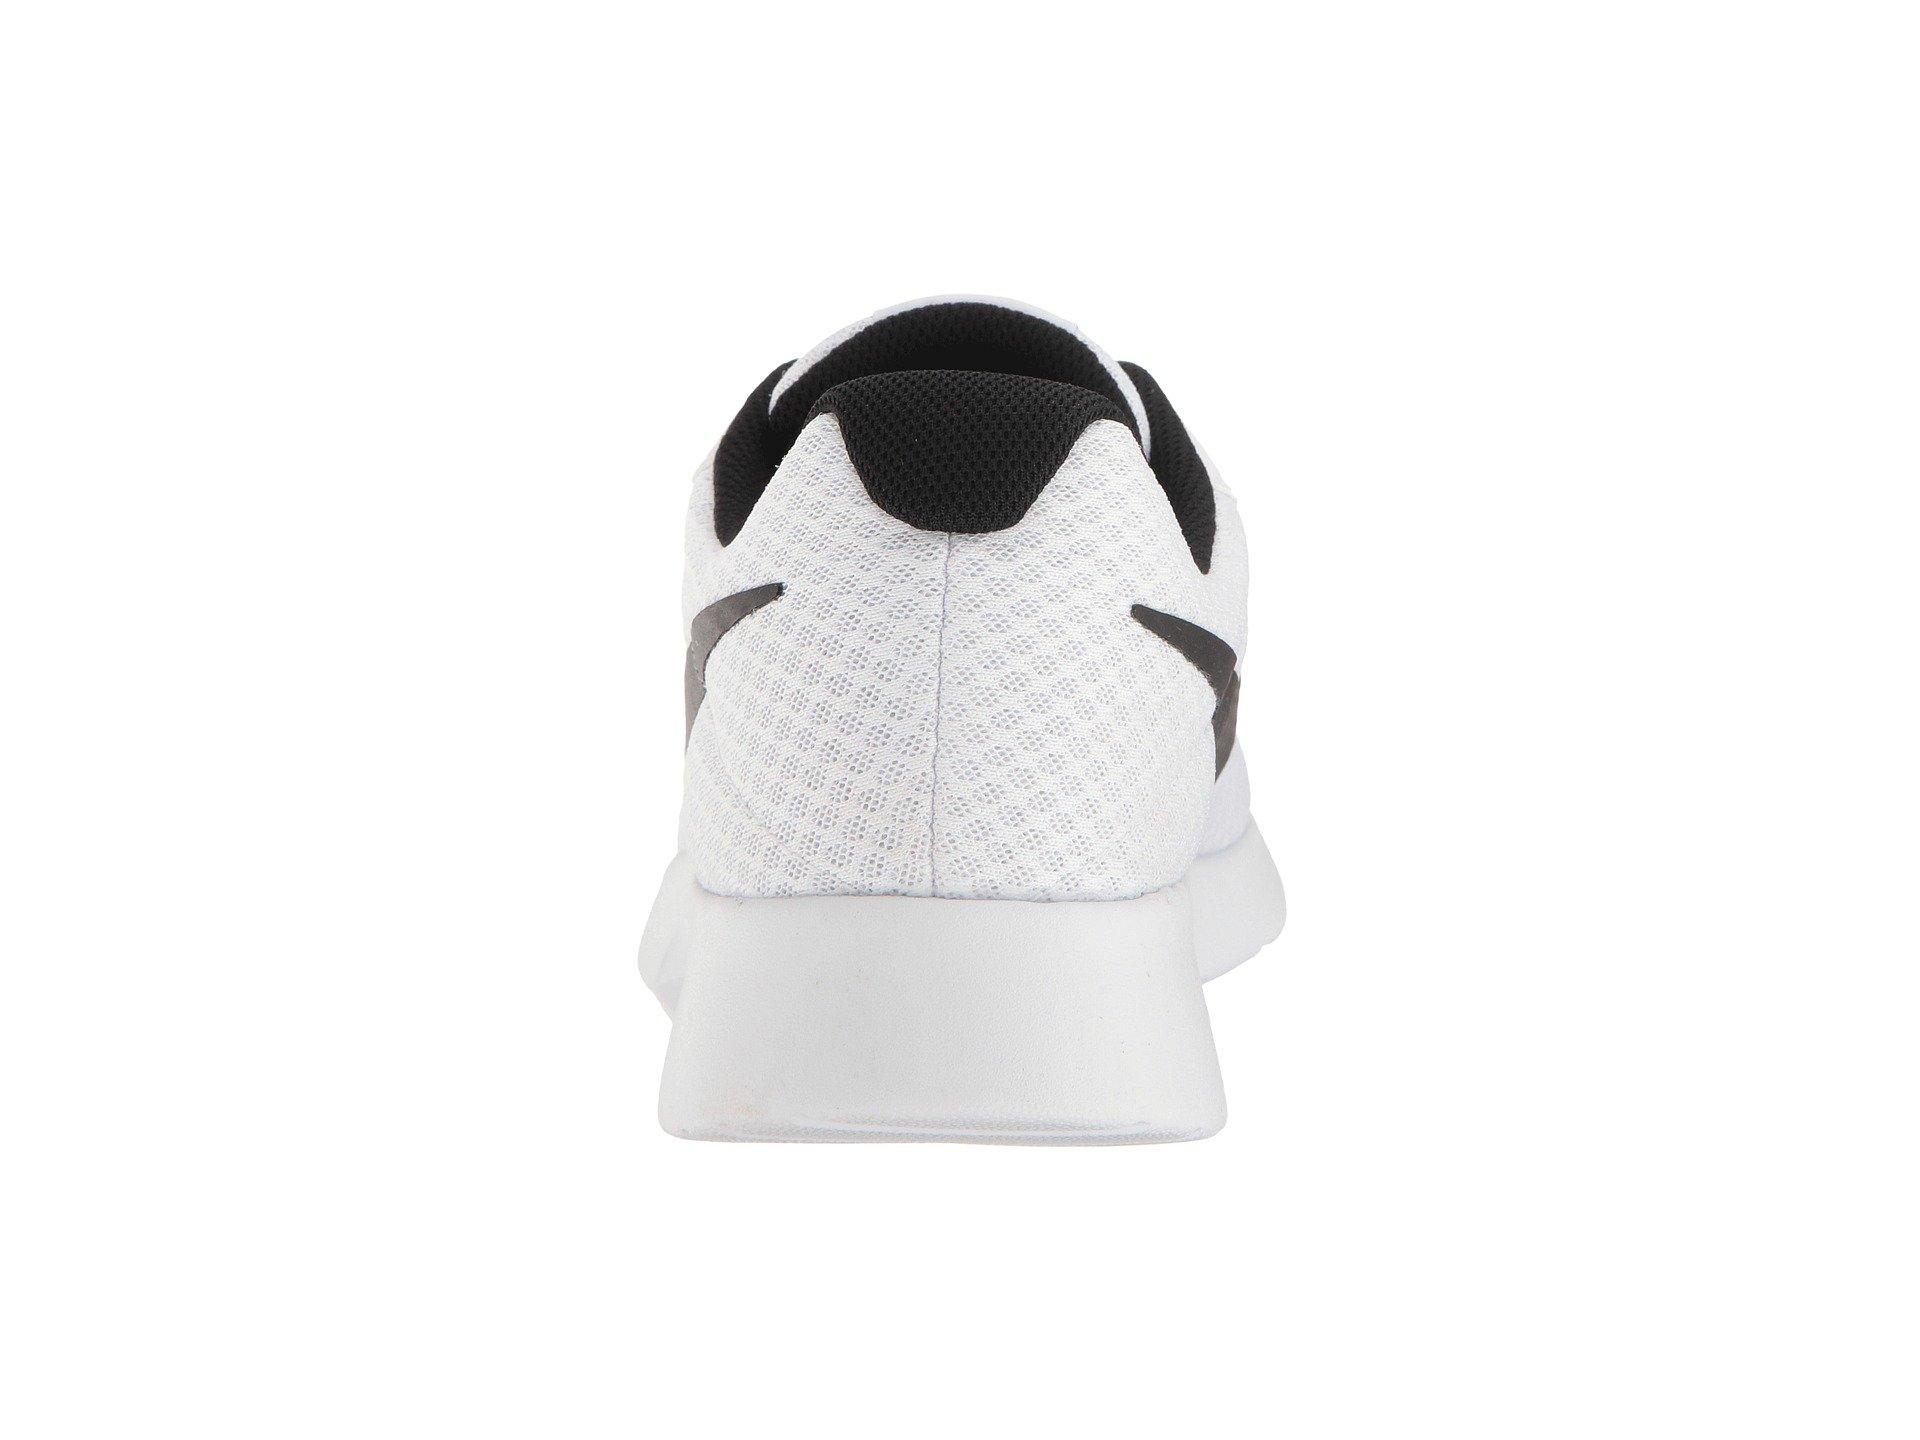 Nike Nike Tanjun Nike White black Tanjun Tanjun White black wXaBqF1x1